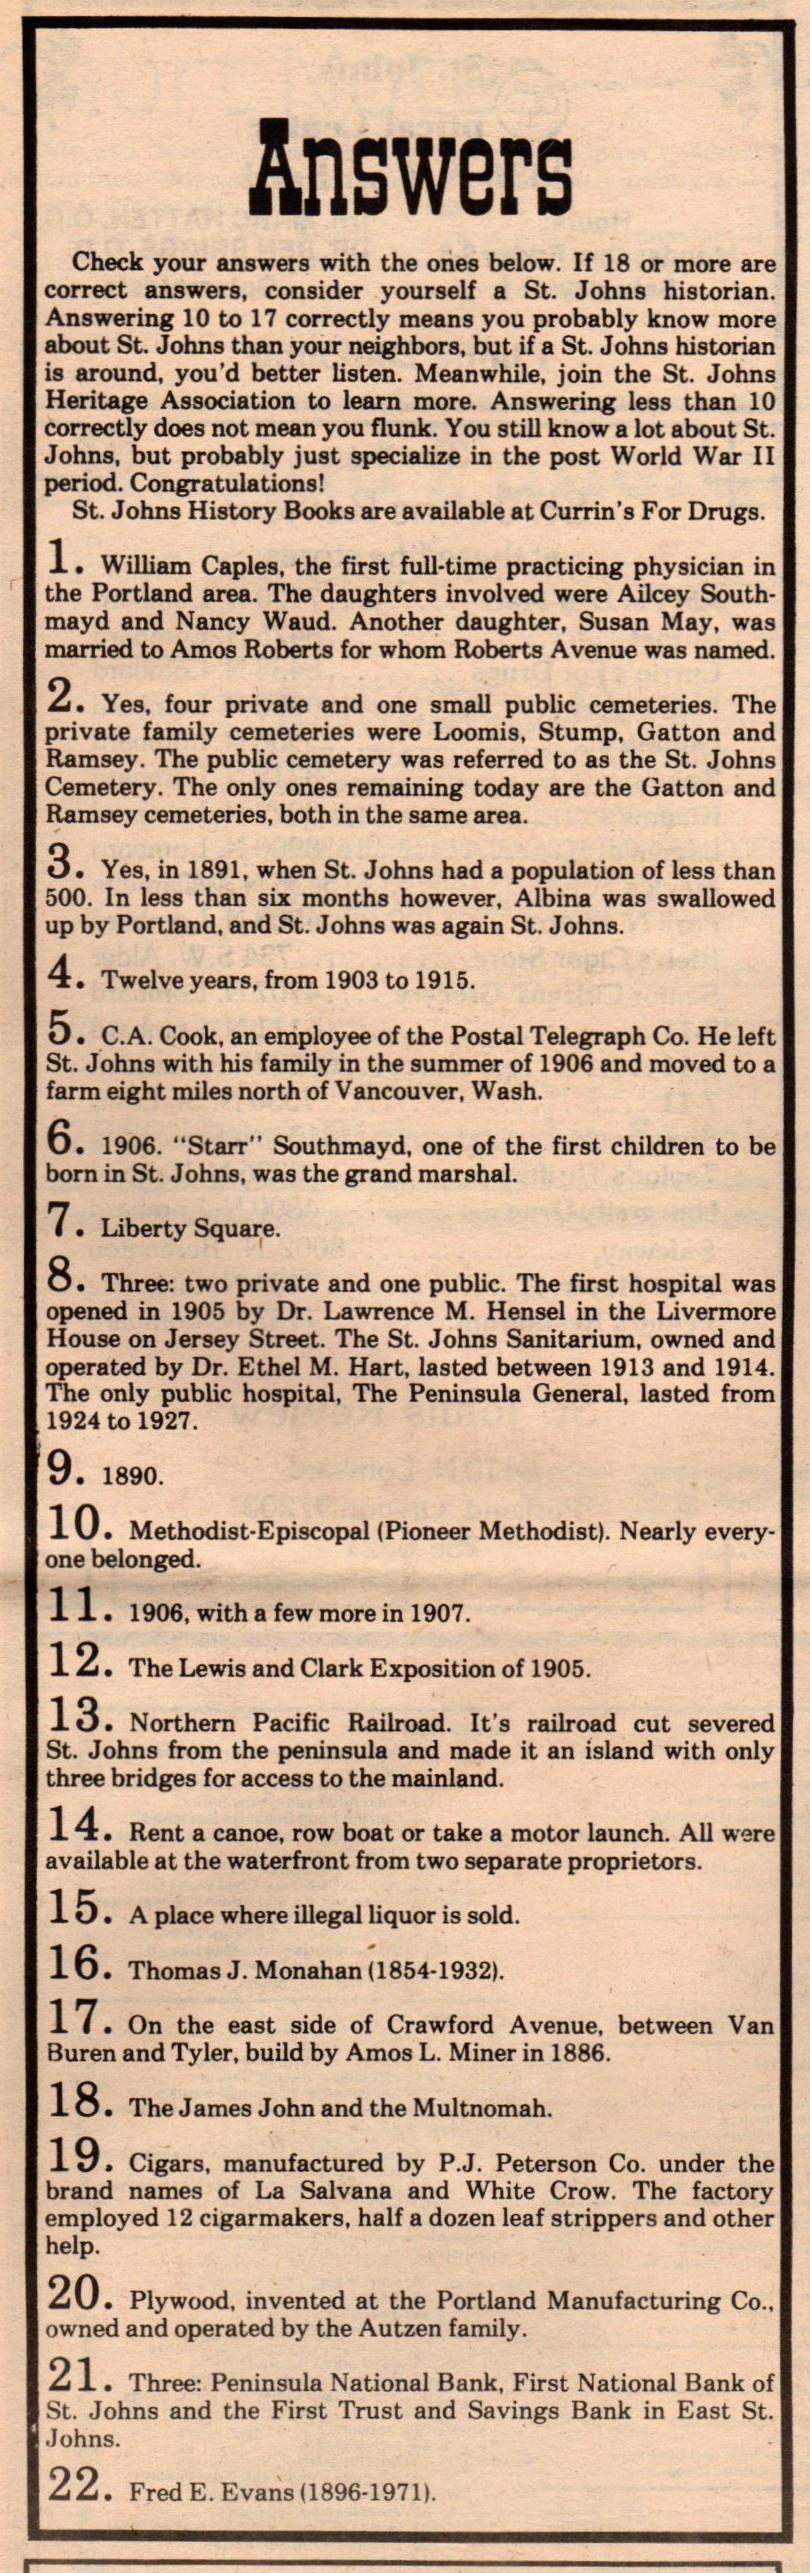 St Johns History Quiz (2)